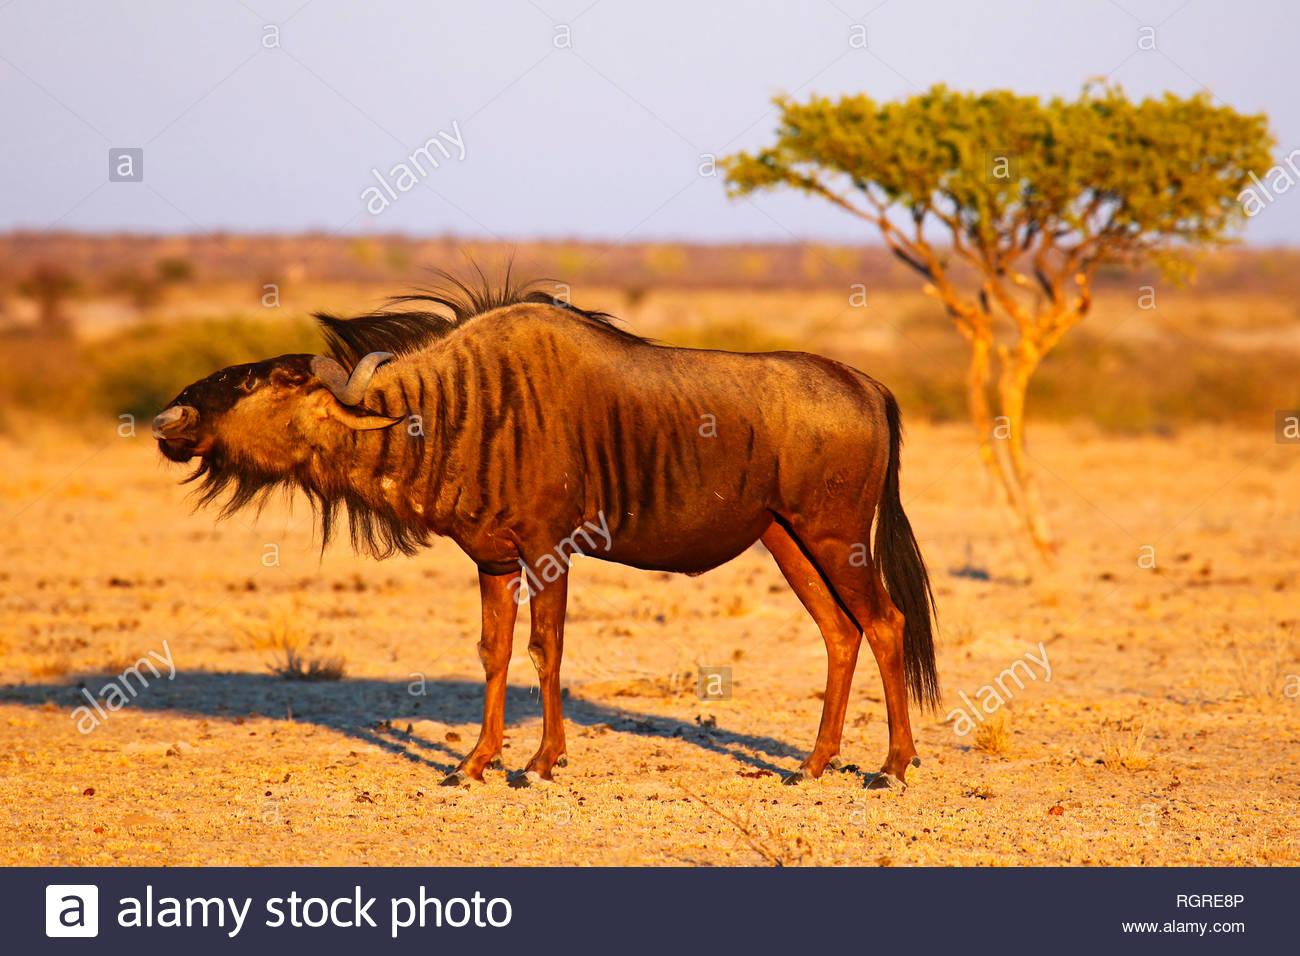 blue wildebeest, Central Kalahari, Botswana, (Connochaetes taurinus) - Stock Image